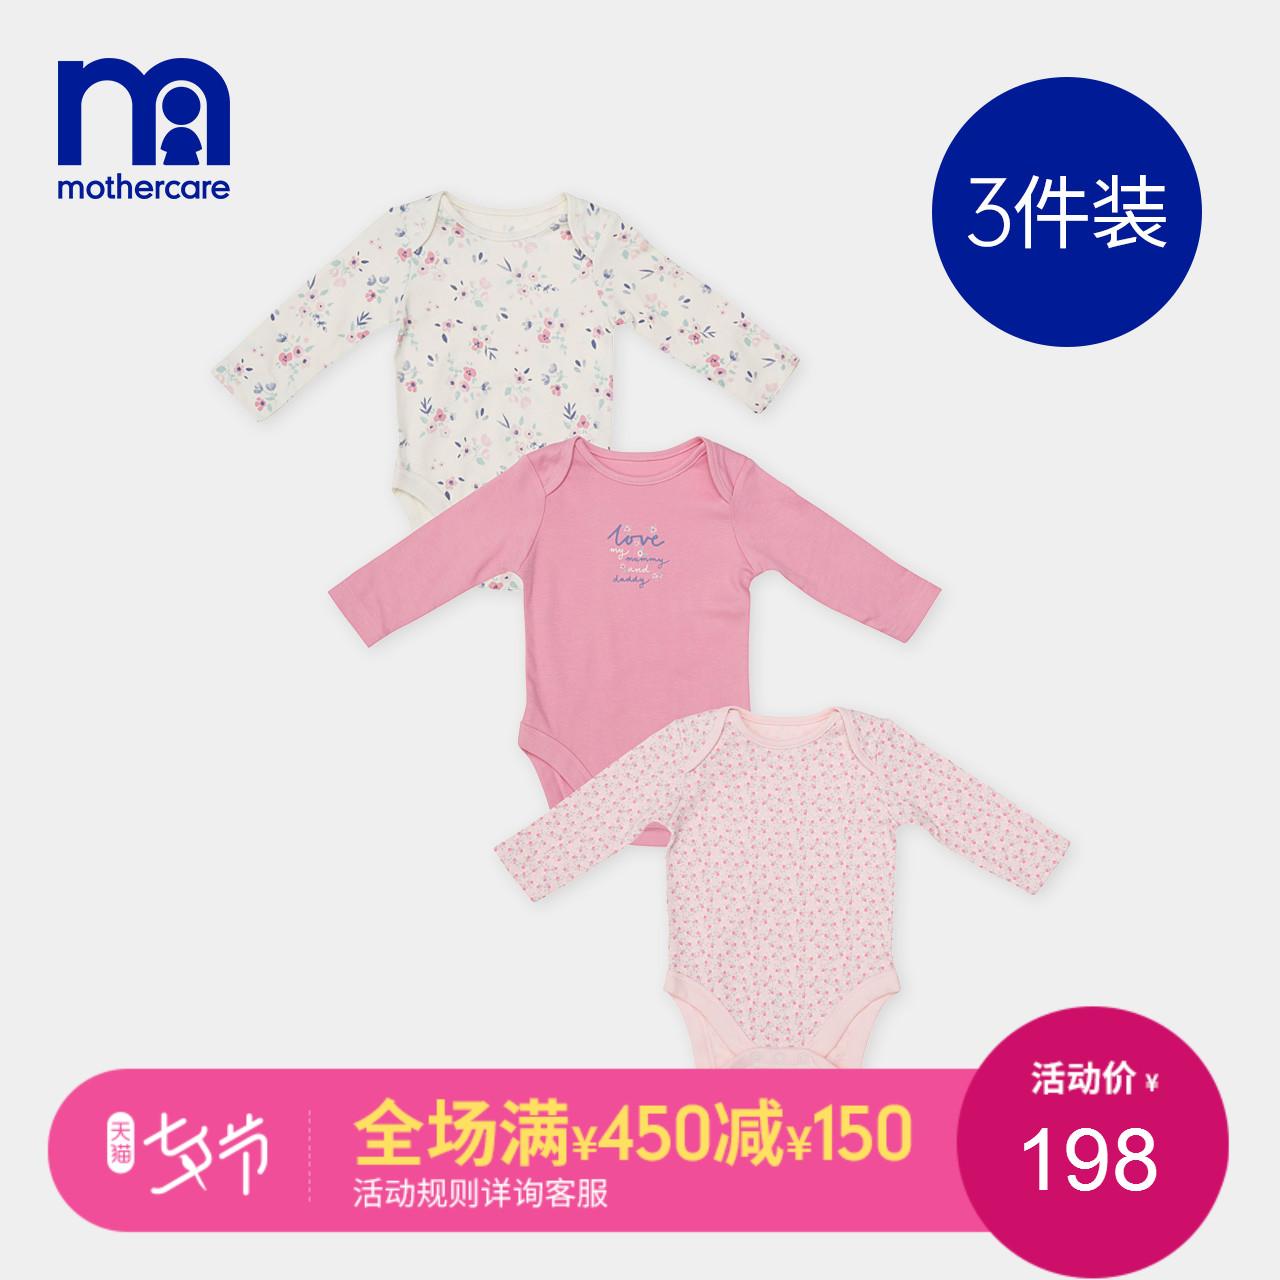 mothercare英国婴儿针织连体衣3件装新生儿宝宝棉质长袖爬服